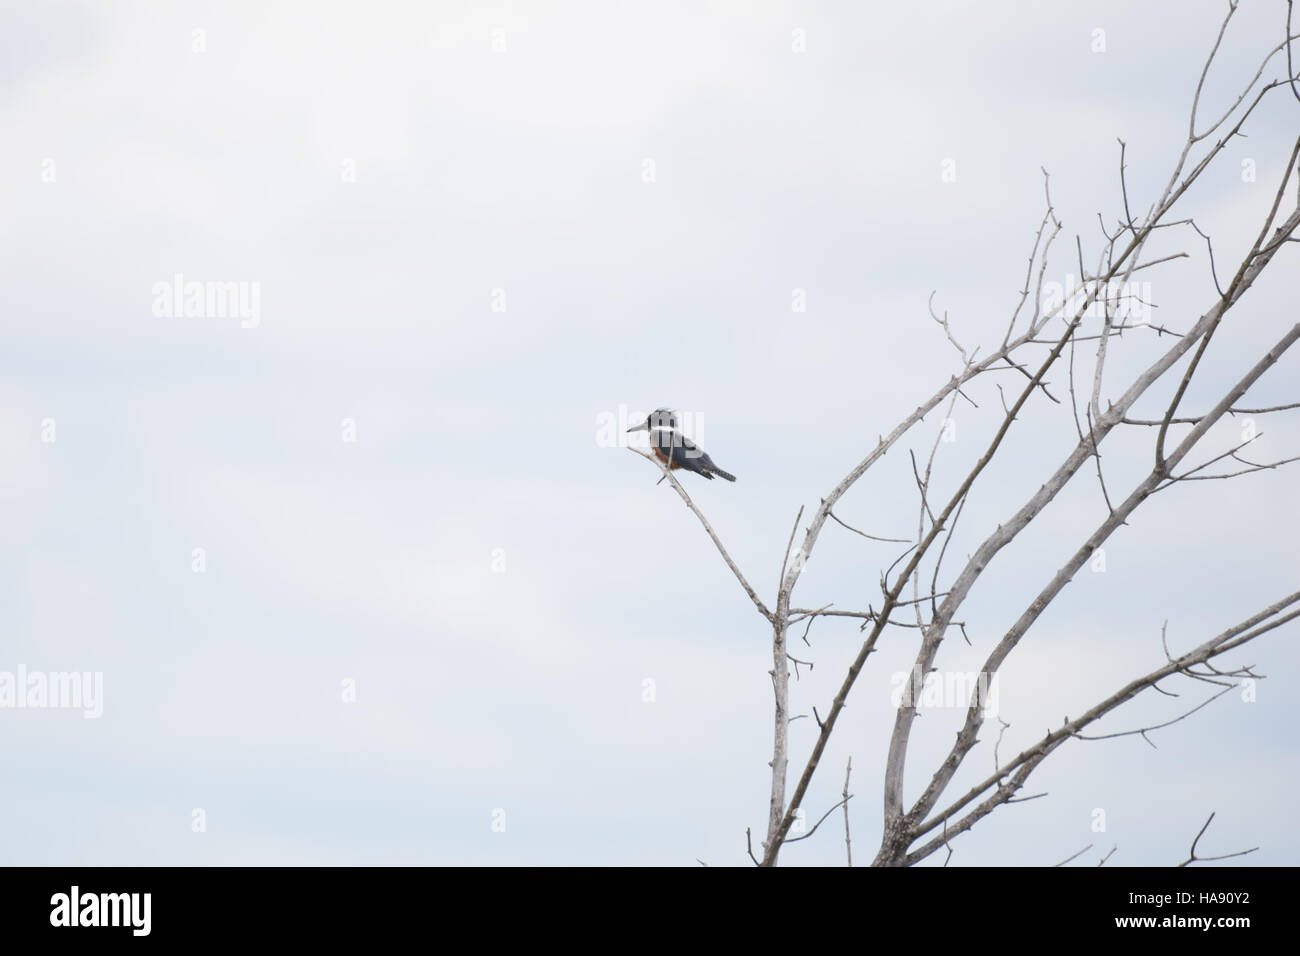 usfwsmtnprairie 28544444893 Belted kingfisher at J. Clark Salyer NWR - Stock Image